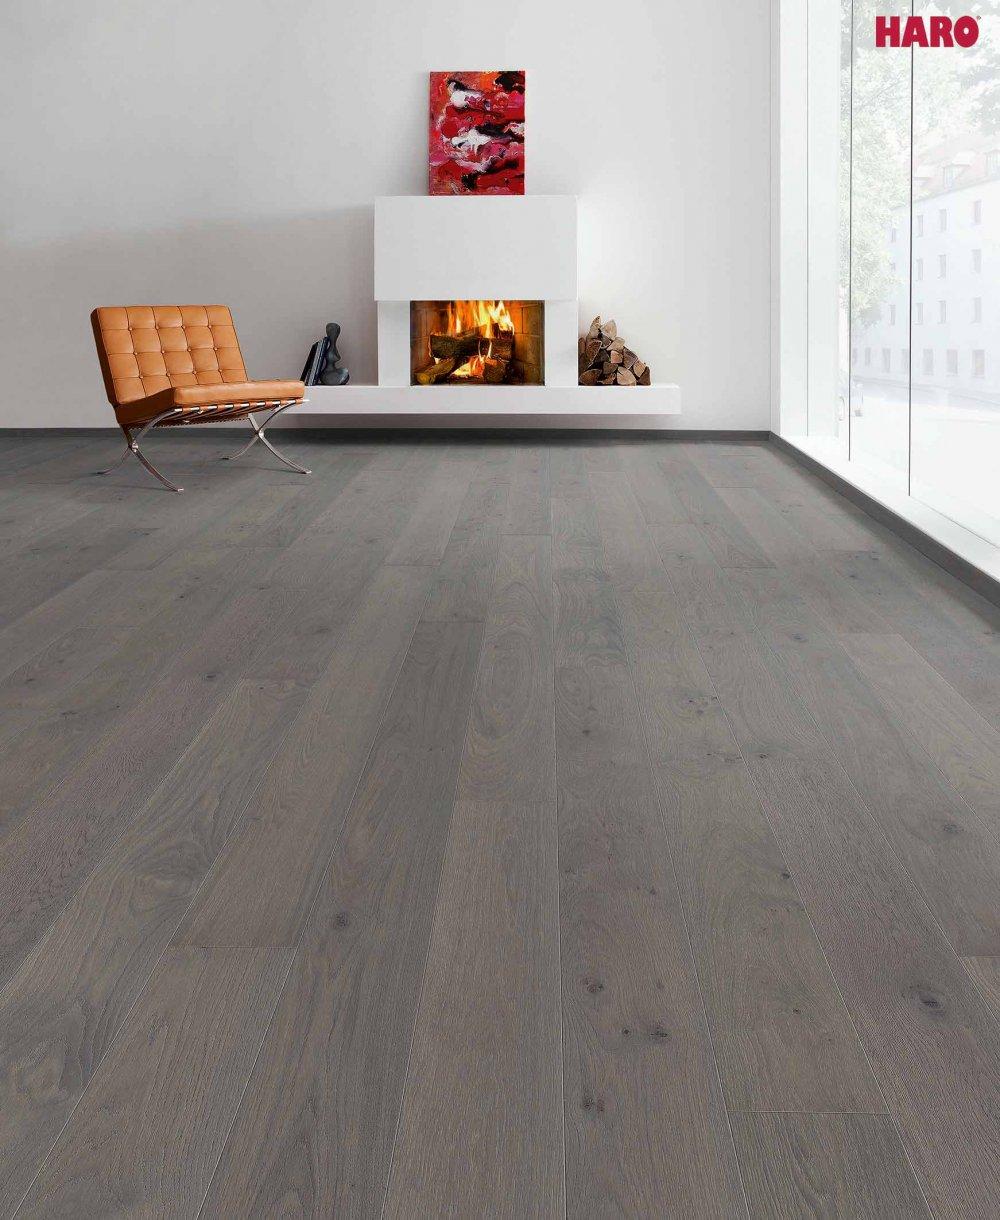 534847 haro parkett landhausdiele 4000 eiche puro vulcano markant natur strukturiert 4v fase. Black Bedroom Furniture Sets. Home Design Ideas